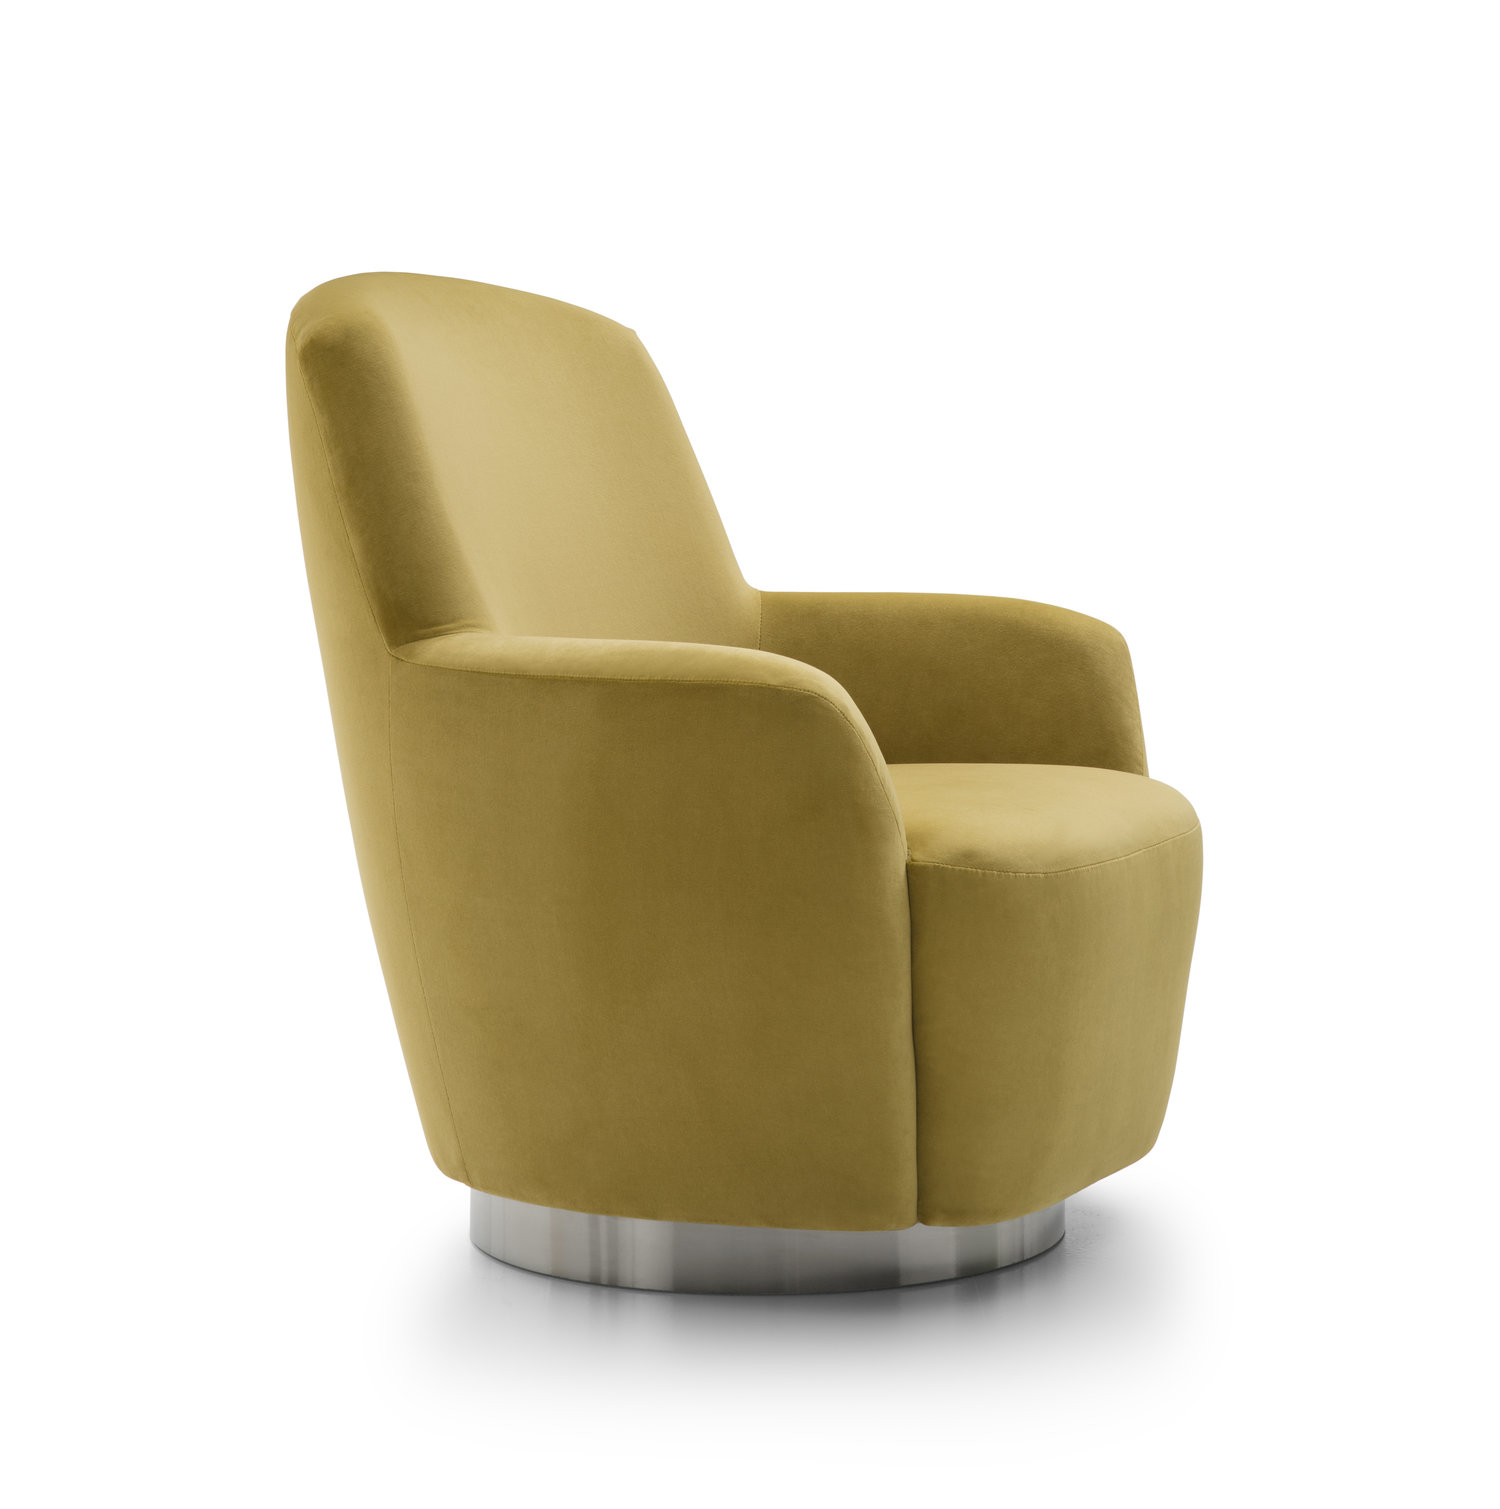 AMC 101H Italian Modern Lounge Chairs